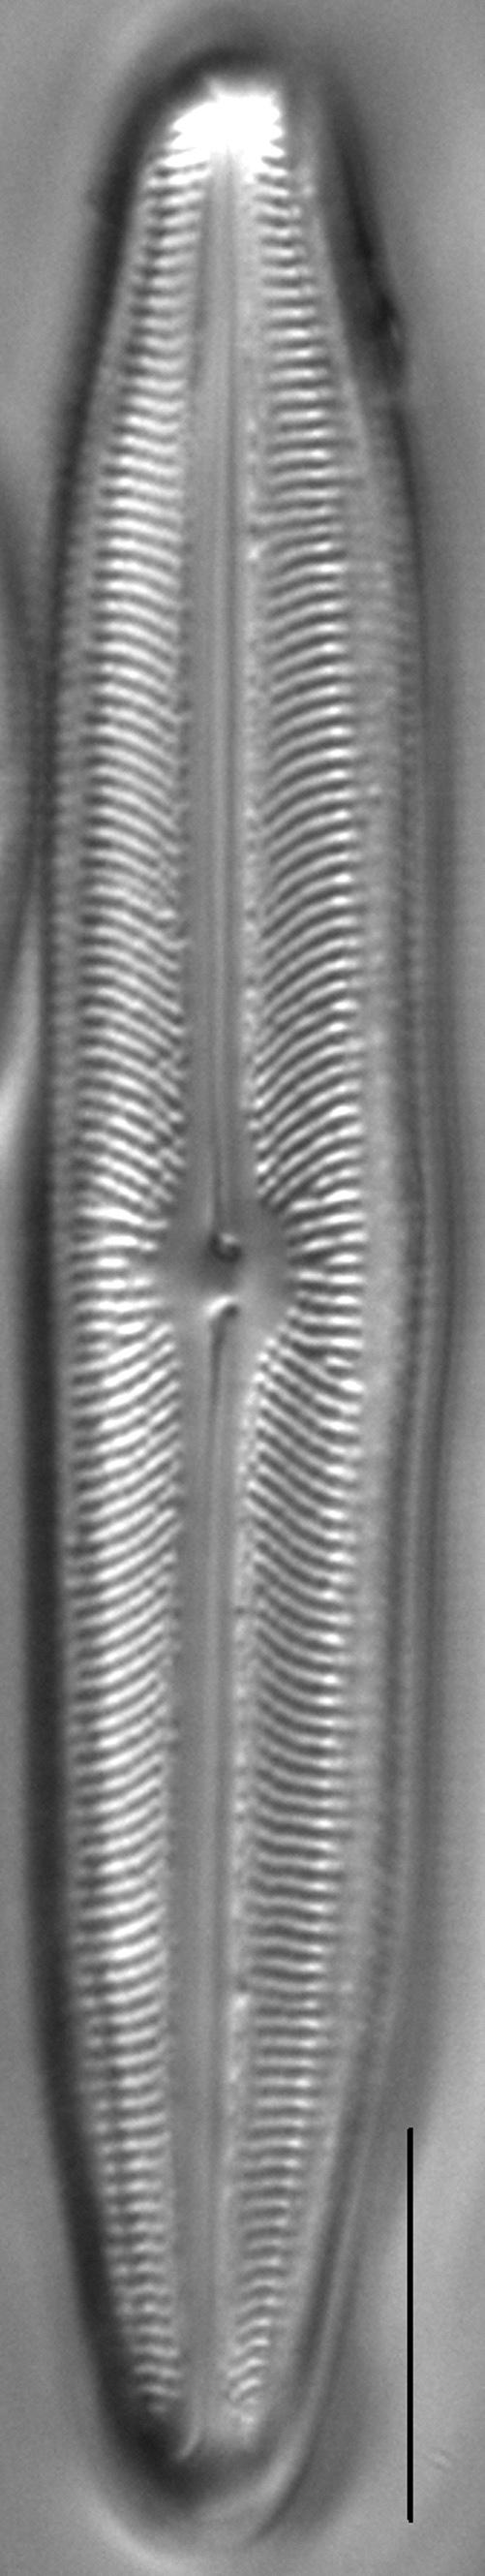 Neidiopsis weilandii LM3